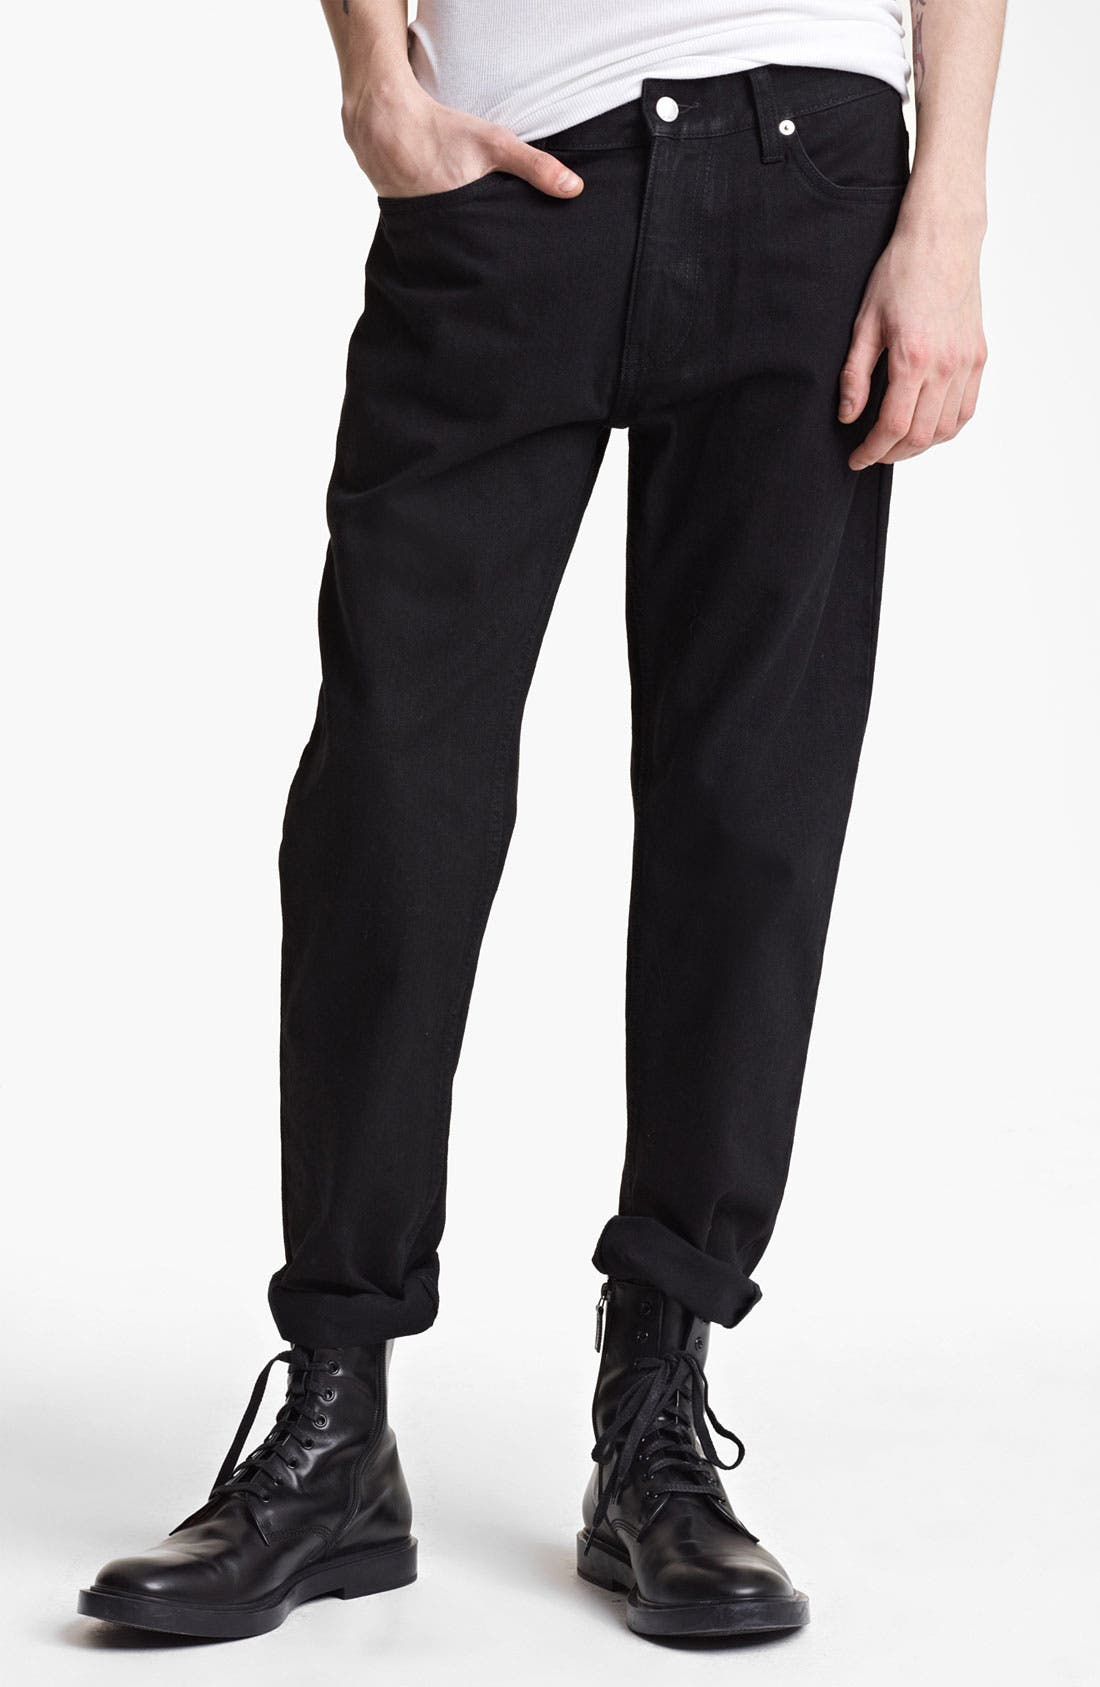 Alternate Image 1 Selected - BLK DNM 'Jeans 5' Slim Straight Coated Denim Jeans (Jet Black)